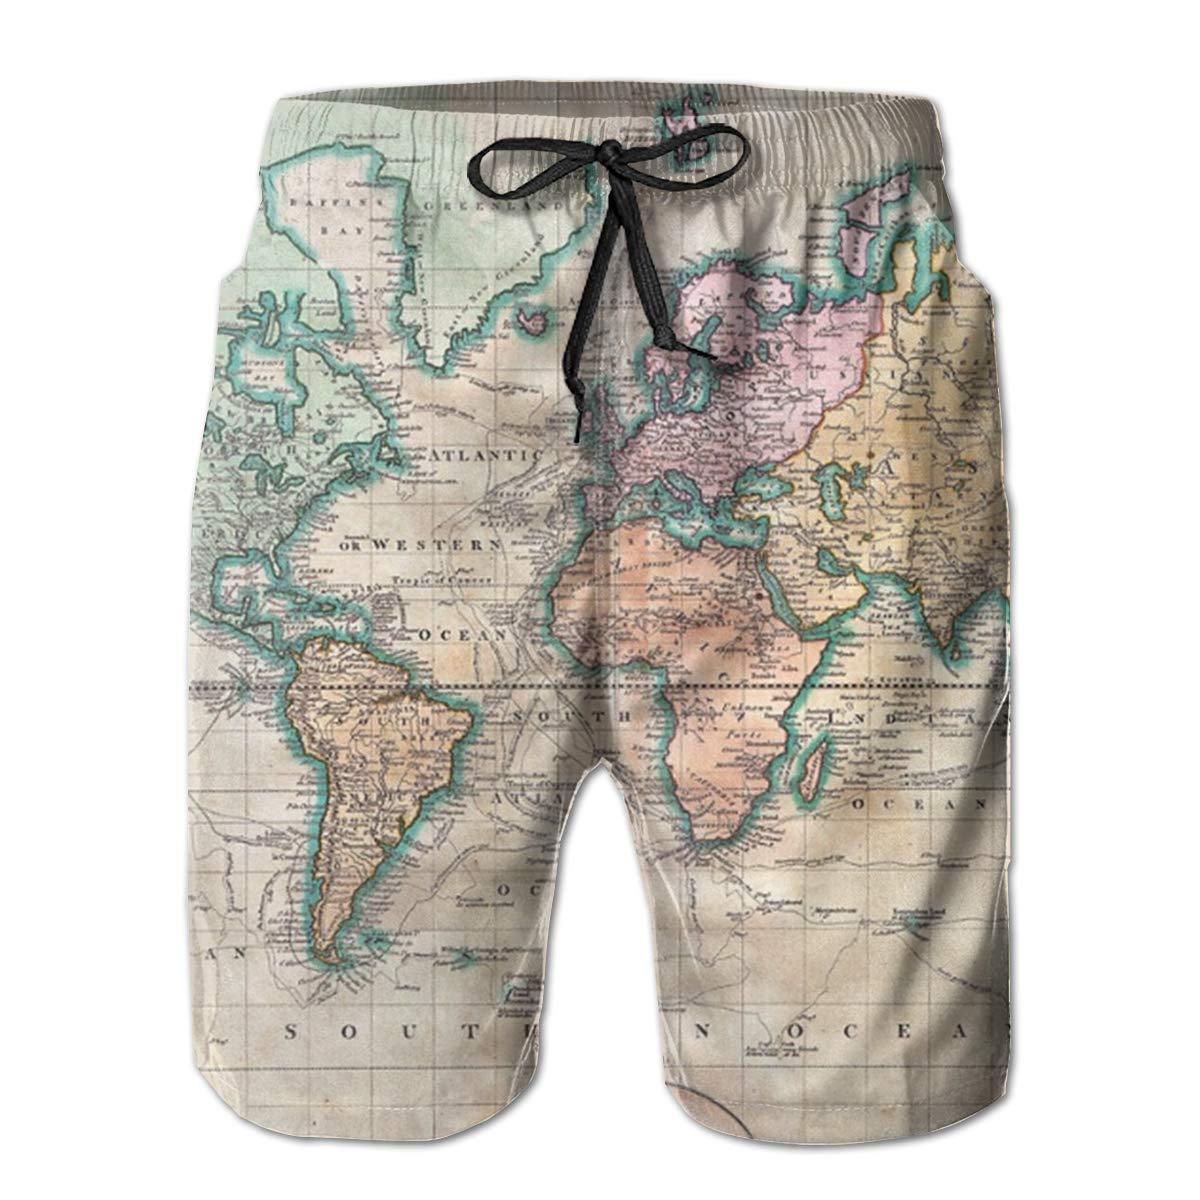 Vintage World Map Mens Beach Shorts Swim Trunks Casual Shorts Sports Shorts